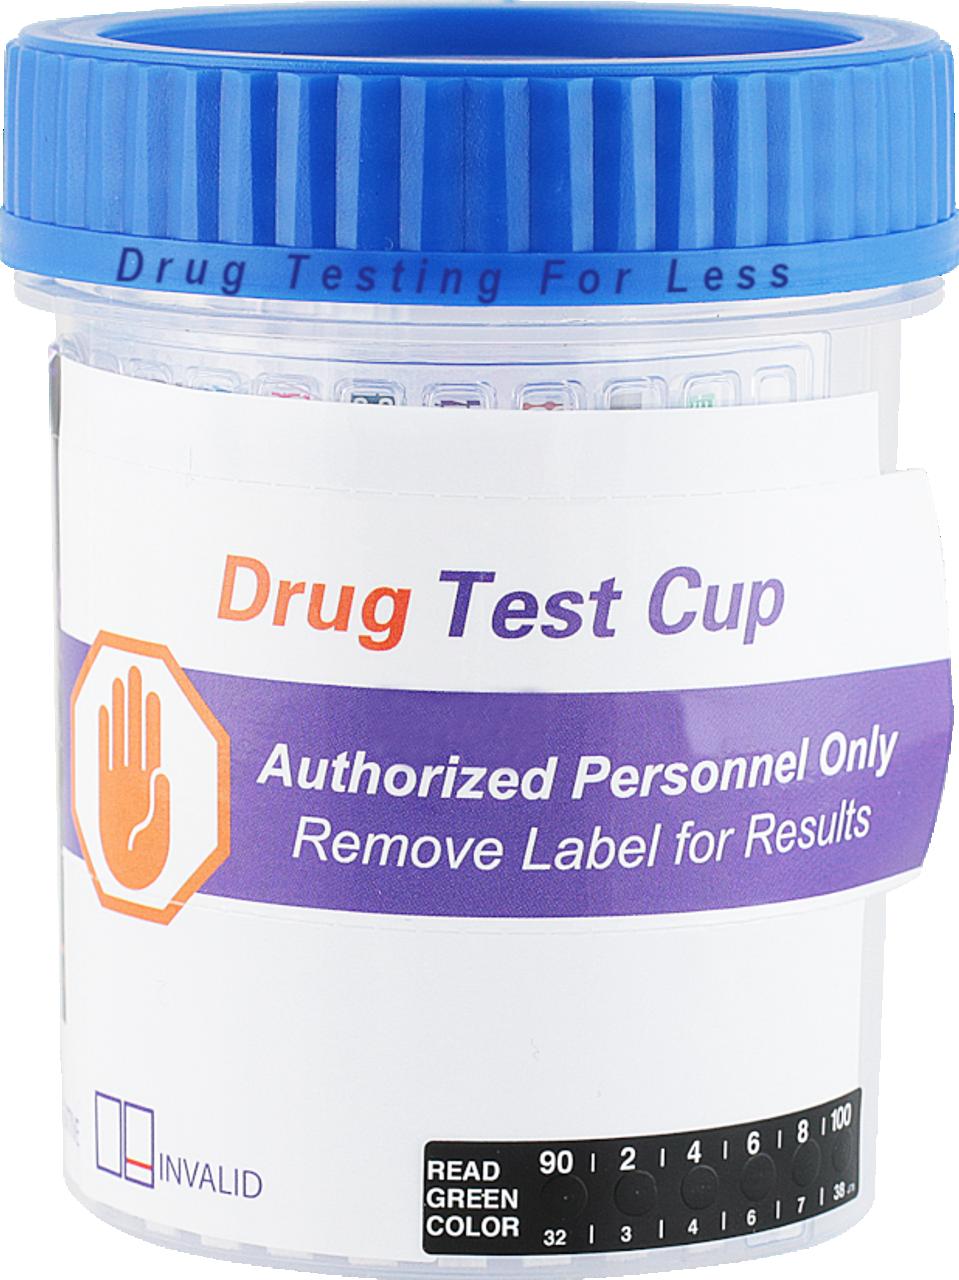 14 Panel Urine Drug Test with ETG and FEN 25/box